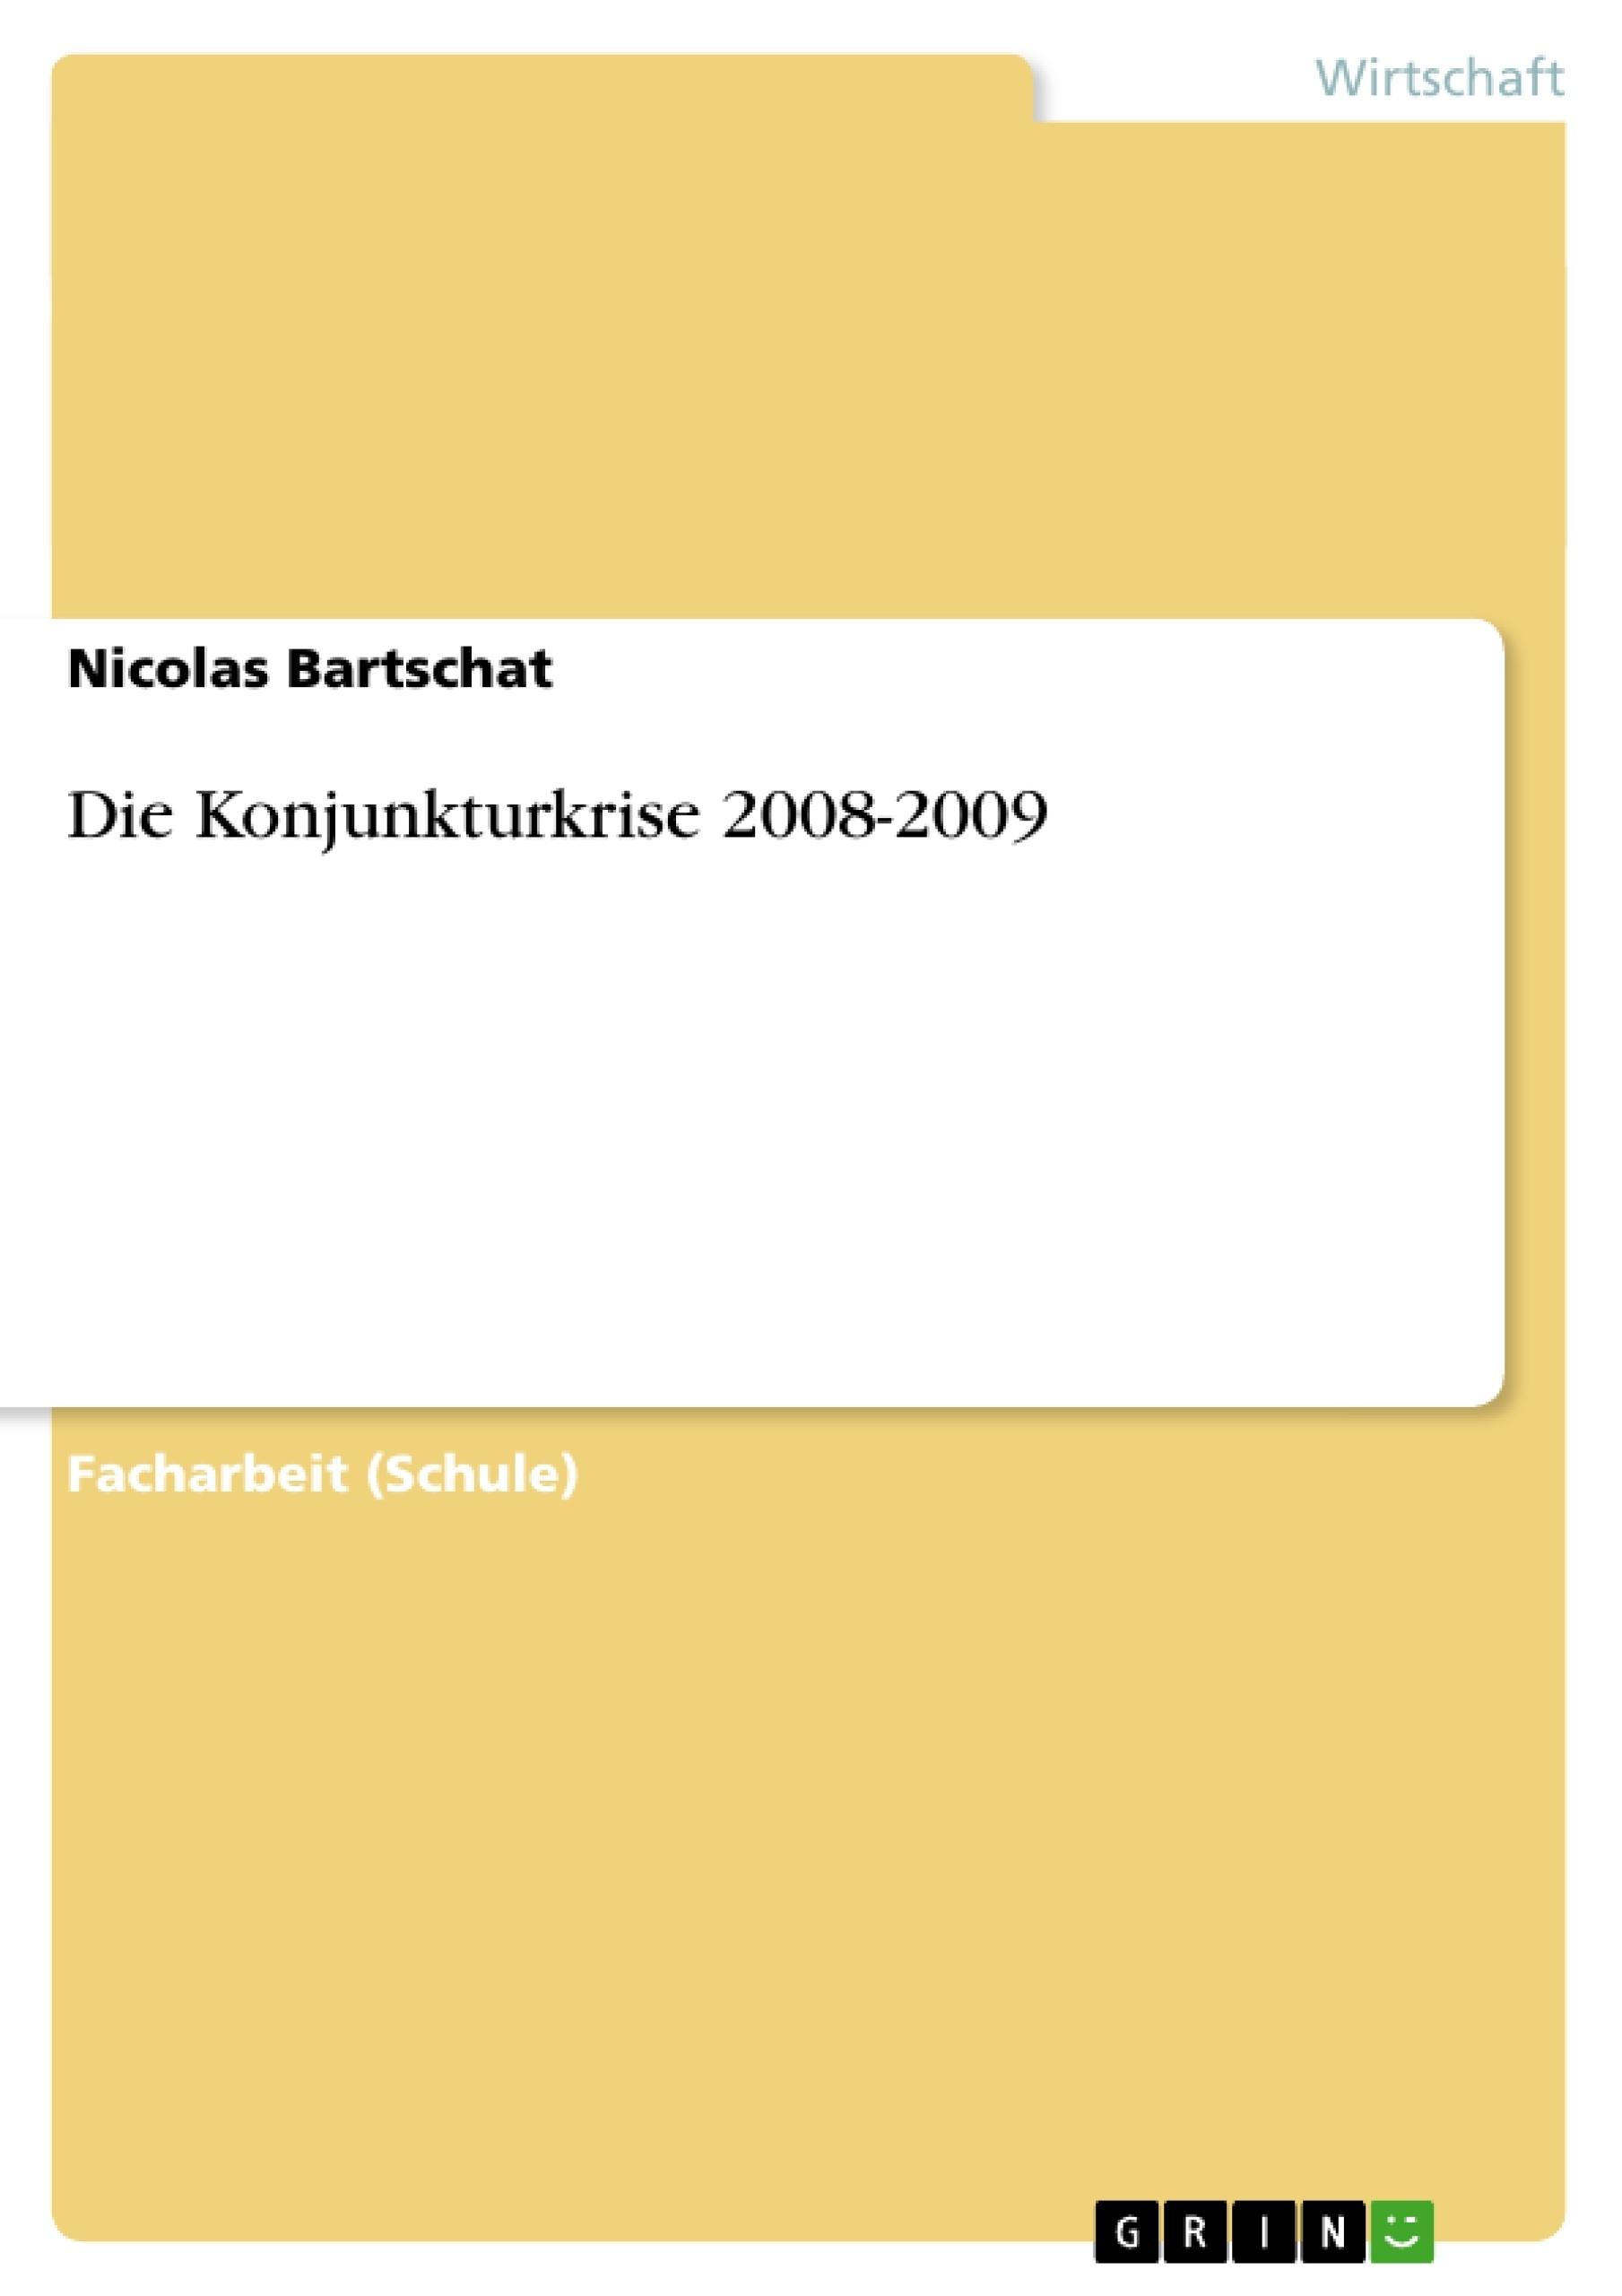 Titel: Die Konjunkturkrise 2008-2009